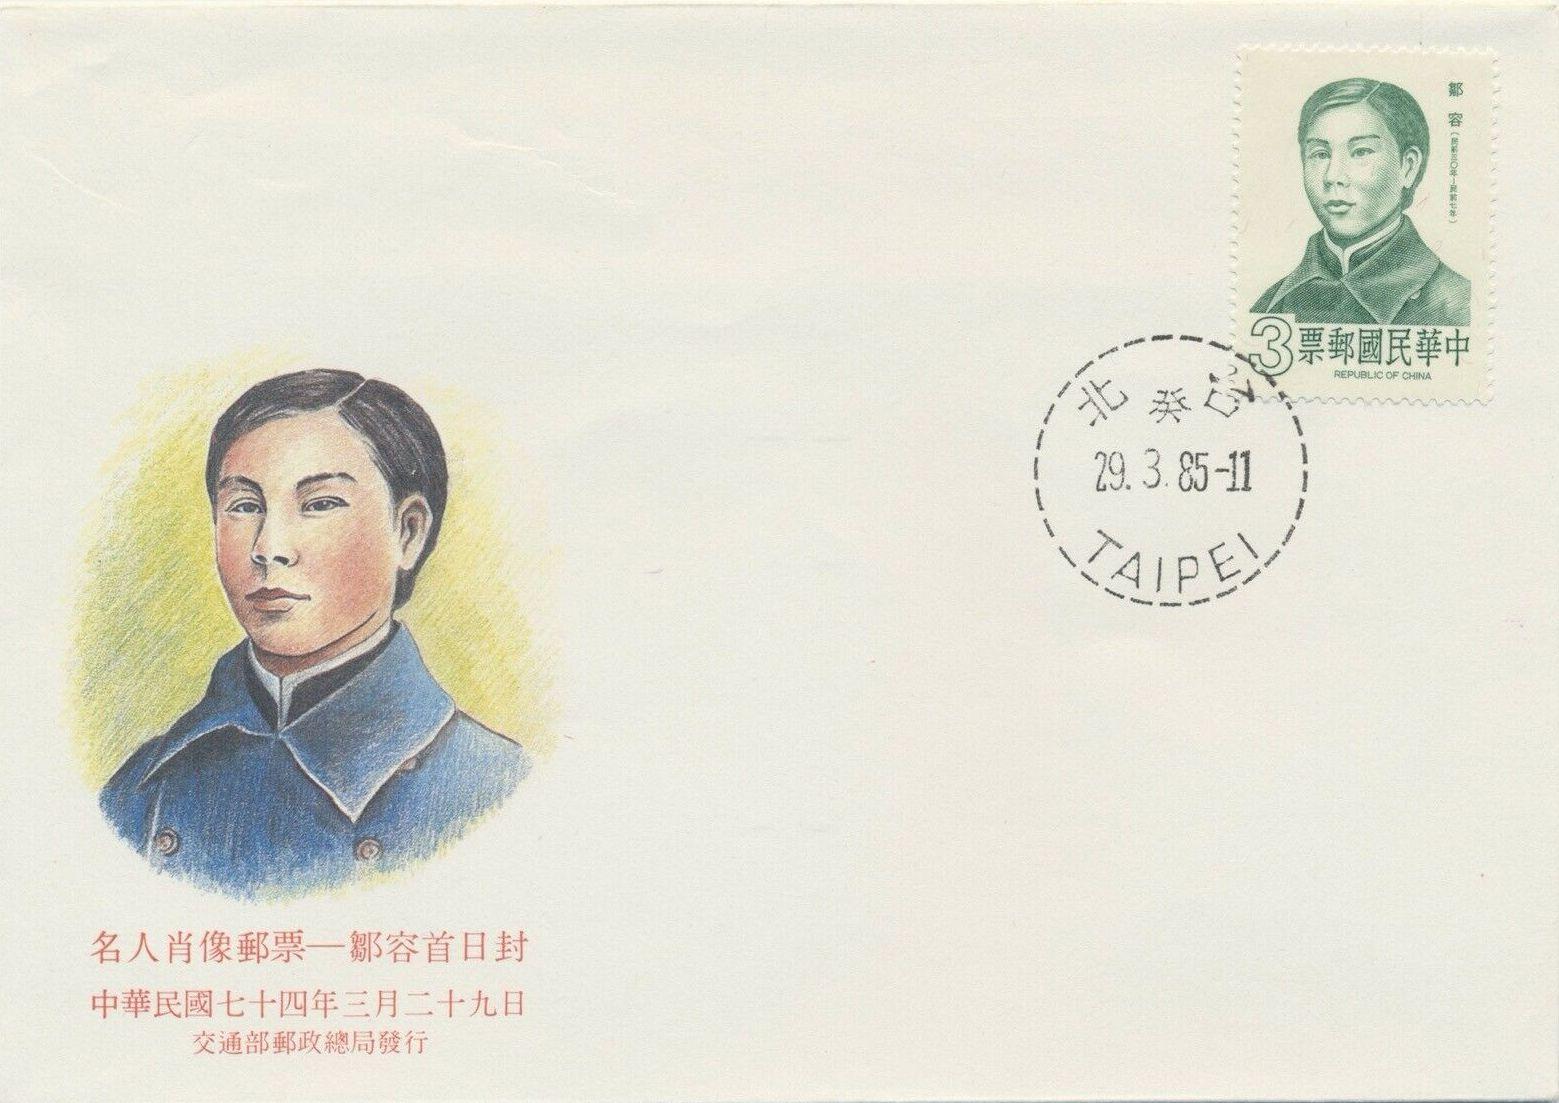 China (Taiwan) 1985 Tsou Jung FDCa.jpg